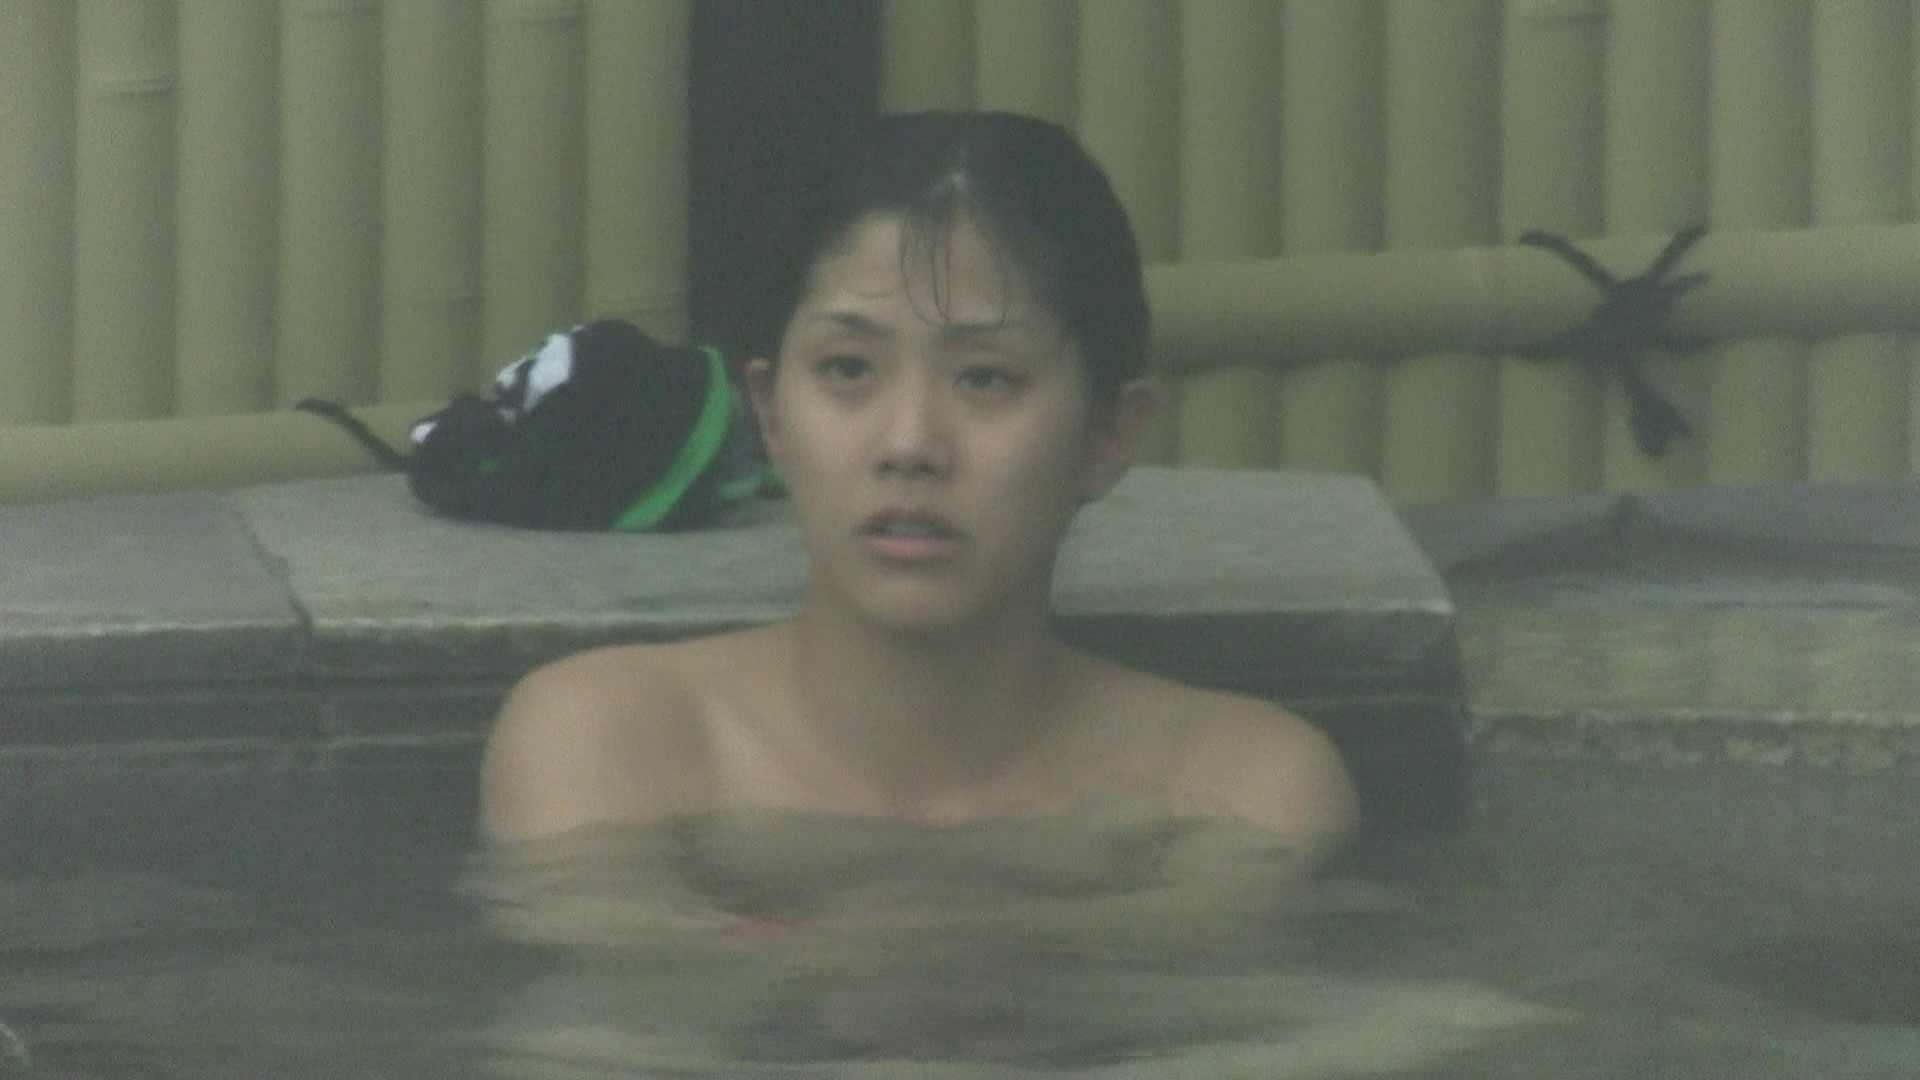 Aquaな露天風呂Vol.174 盗撮師作品 われめAV動画紹介 69pic 50